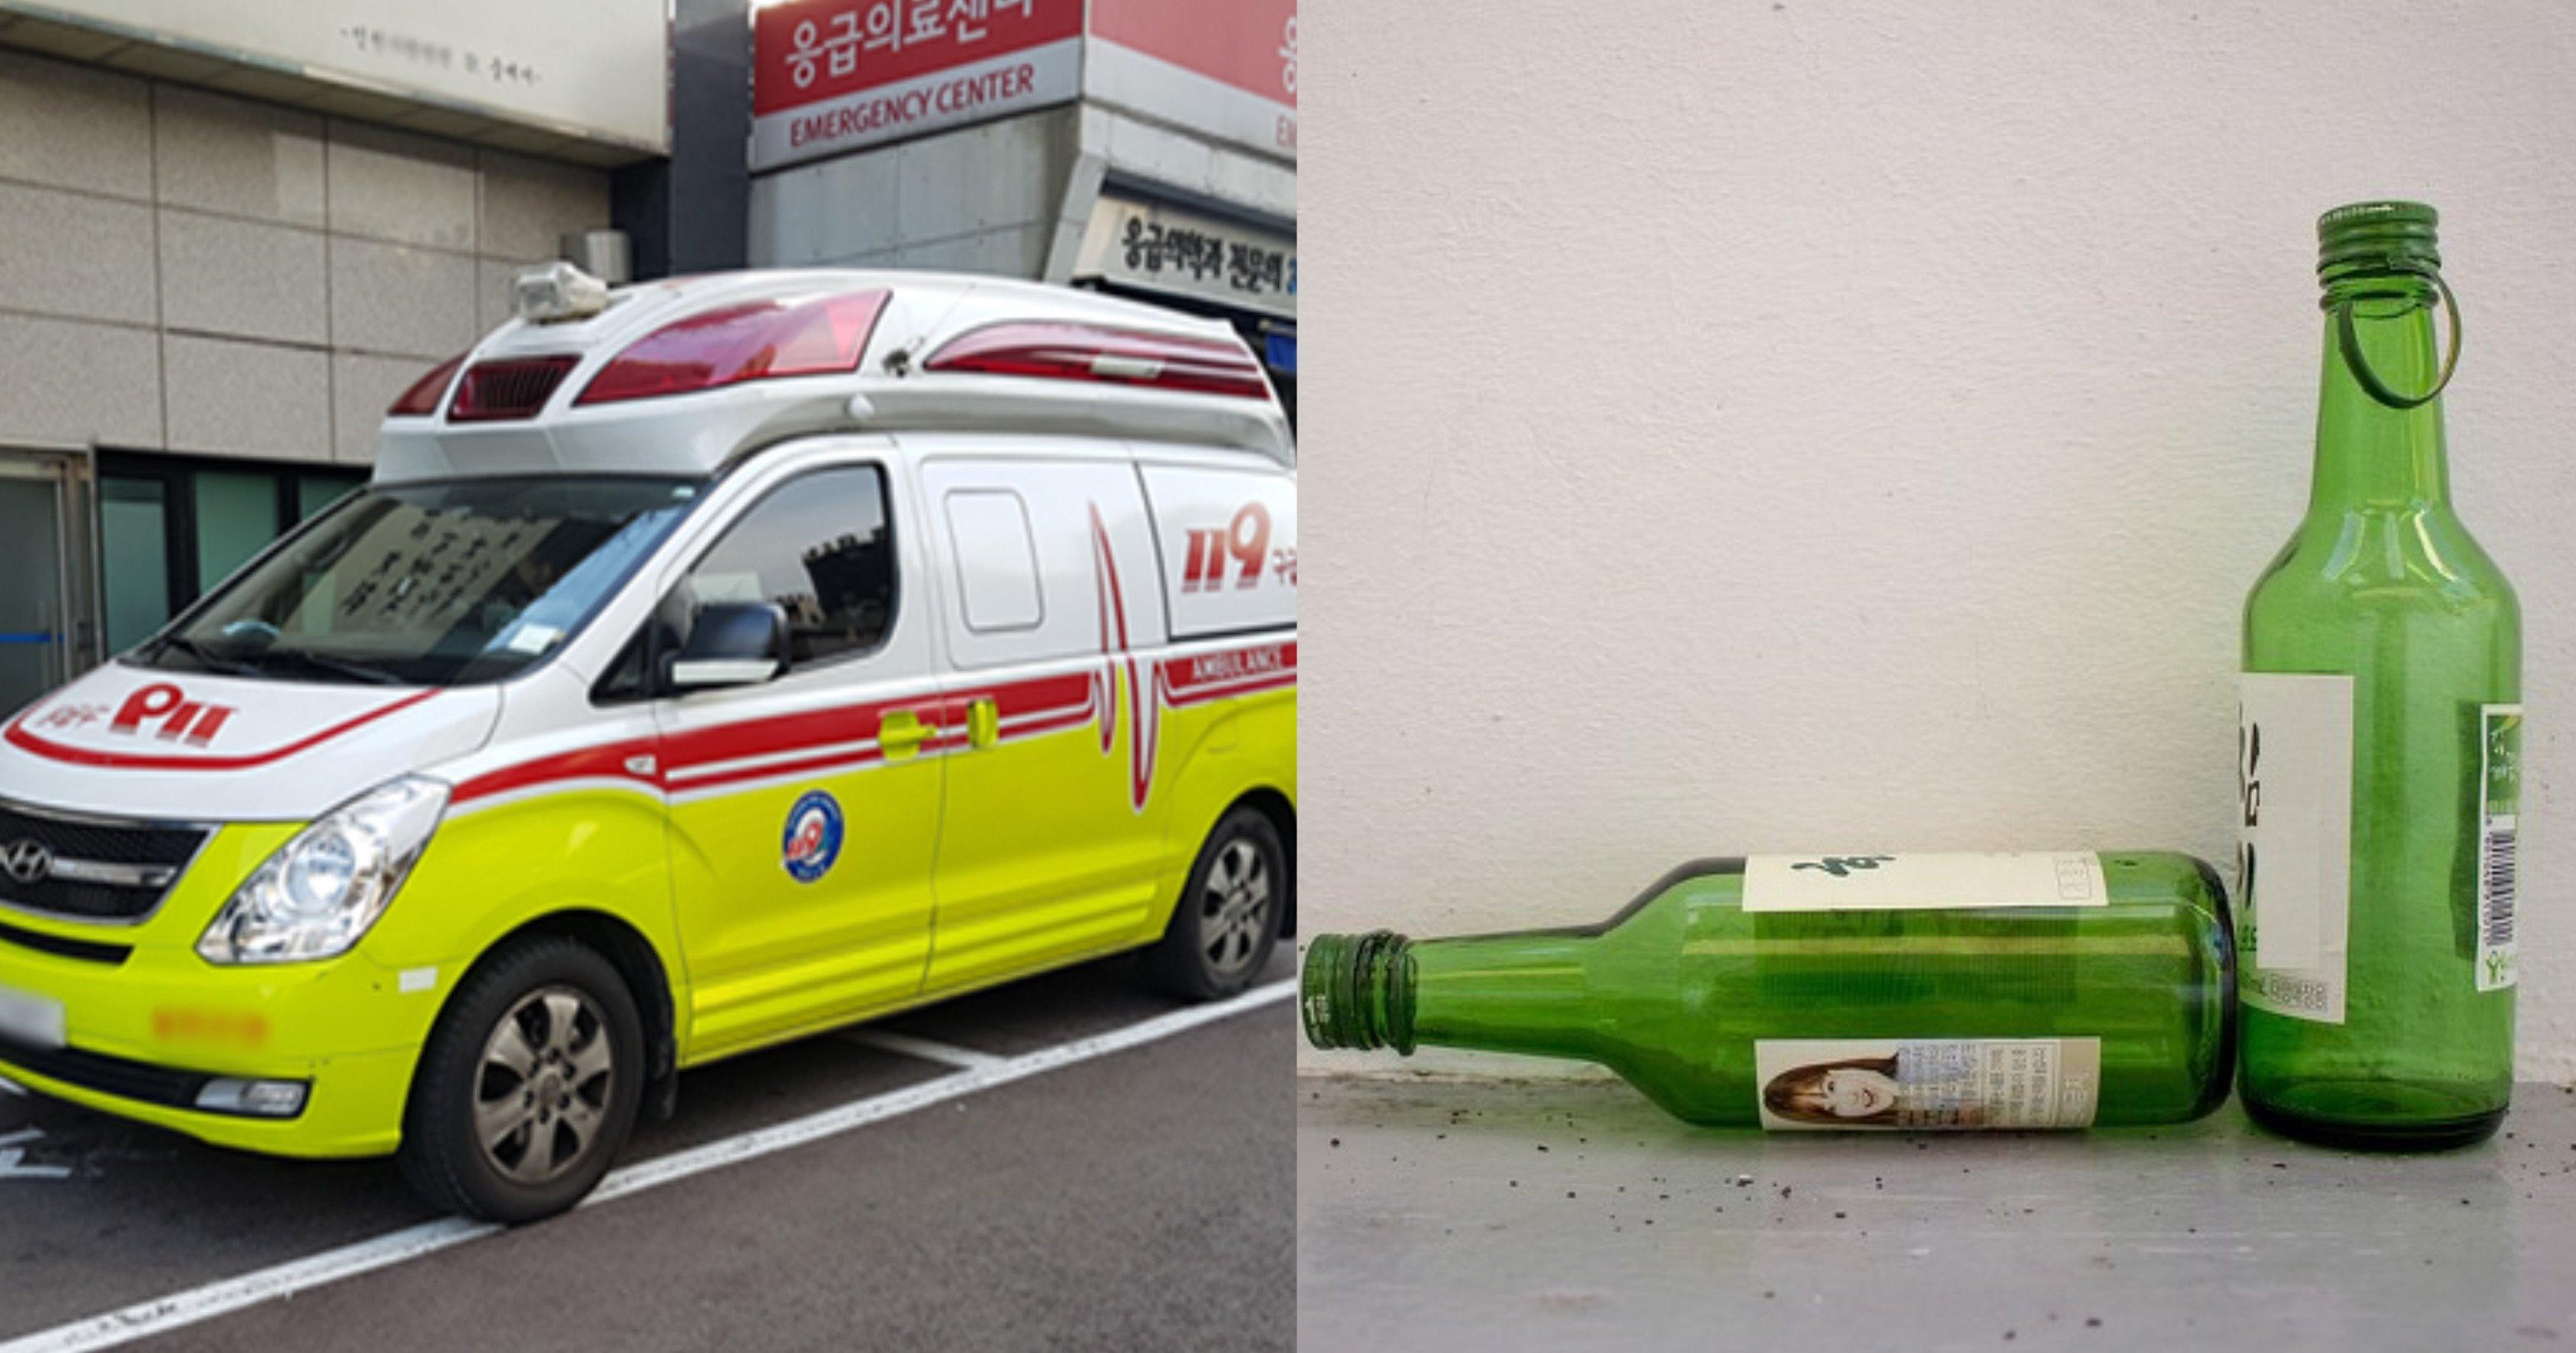 "ec868ceca3bcebb391 ec8db8eb84a4ec9dbc.jpg?resize=412,232 - ""술마신것 들키면 안되서...""...12층에서 '달리는 구급차'에 '소주병' 던져버린 남성"